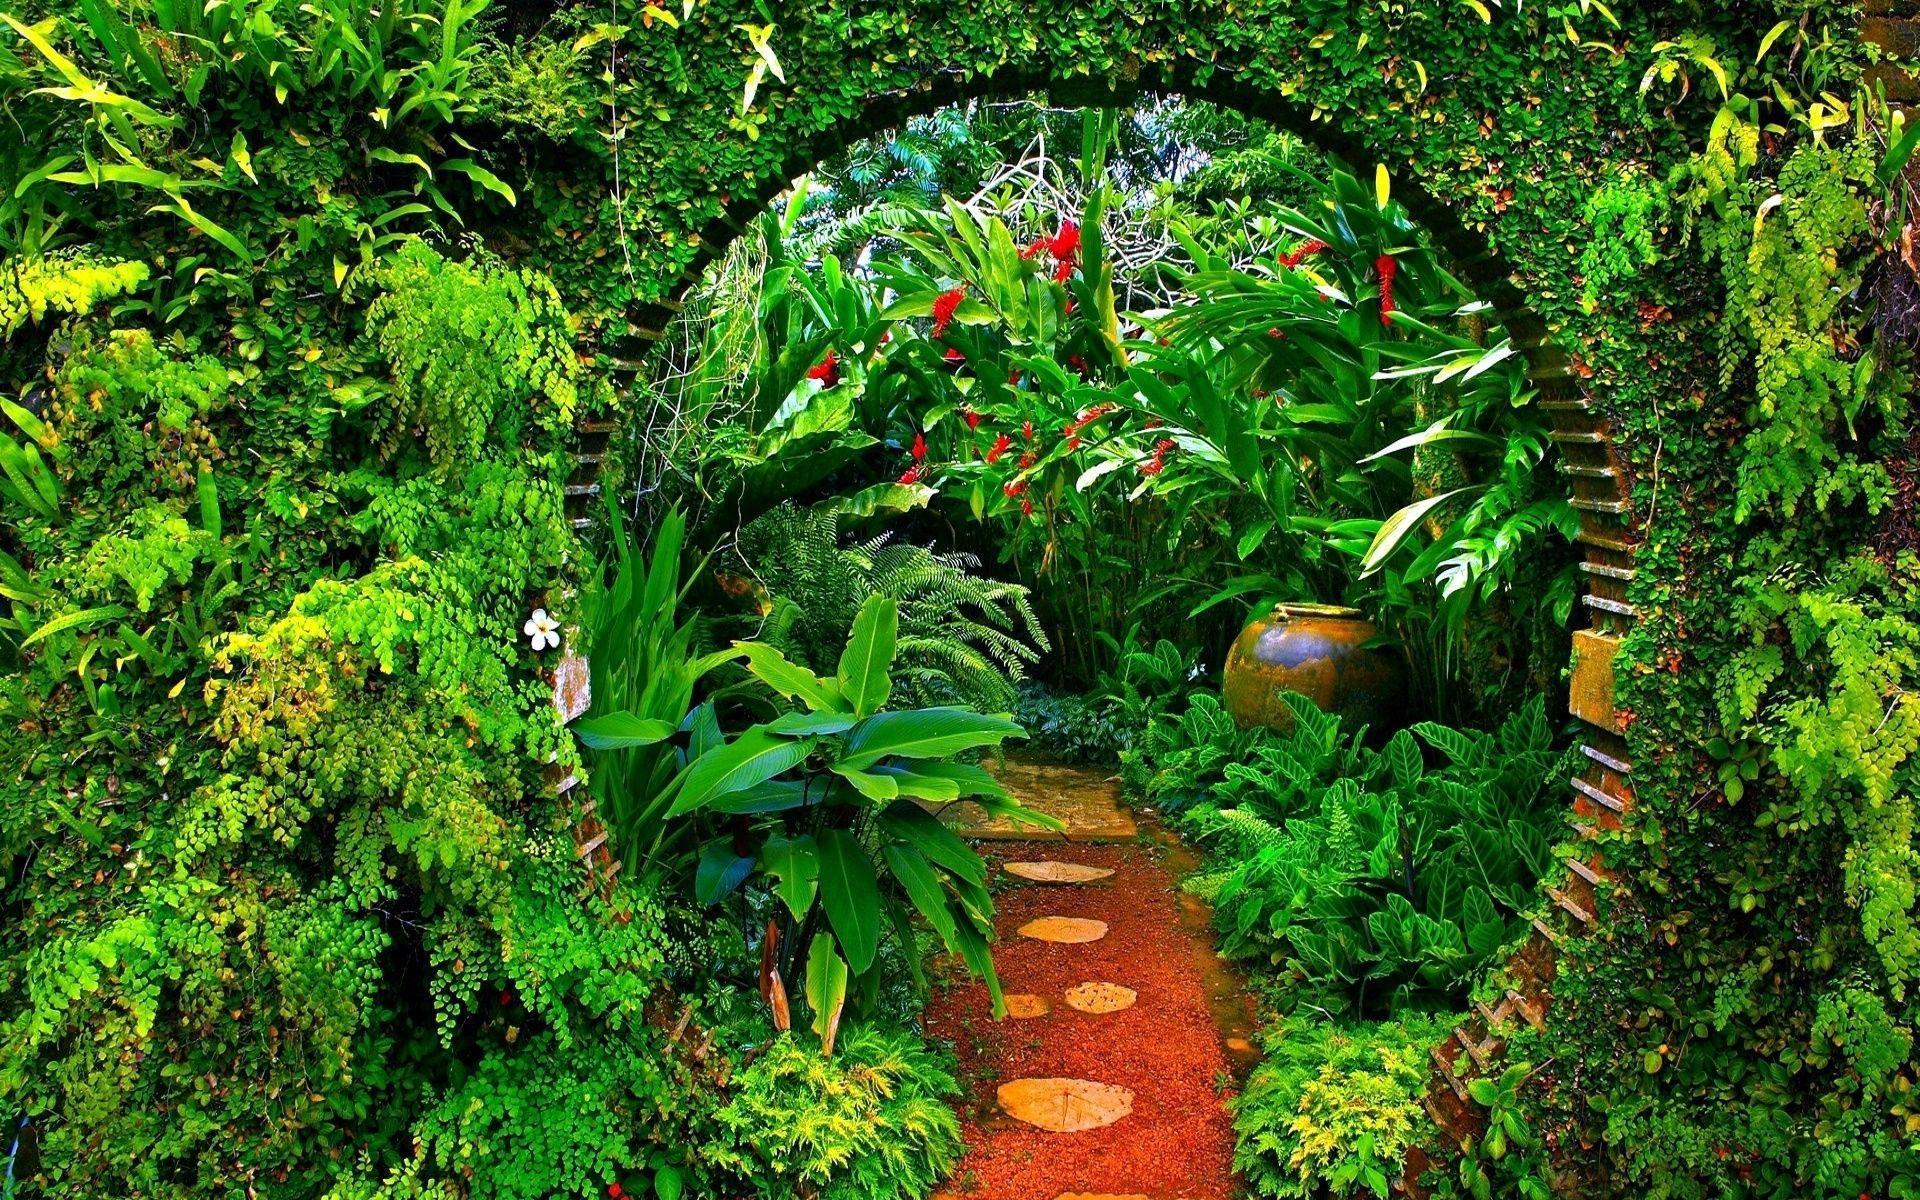 Plant Aesthetic Desktop Wallpapers - Top Free Plant ...